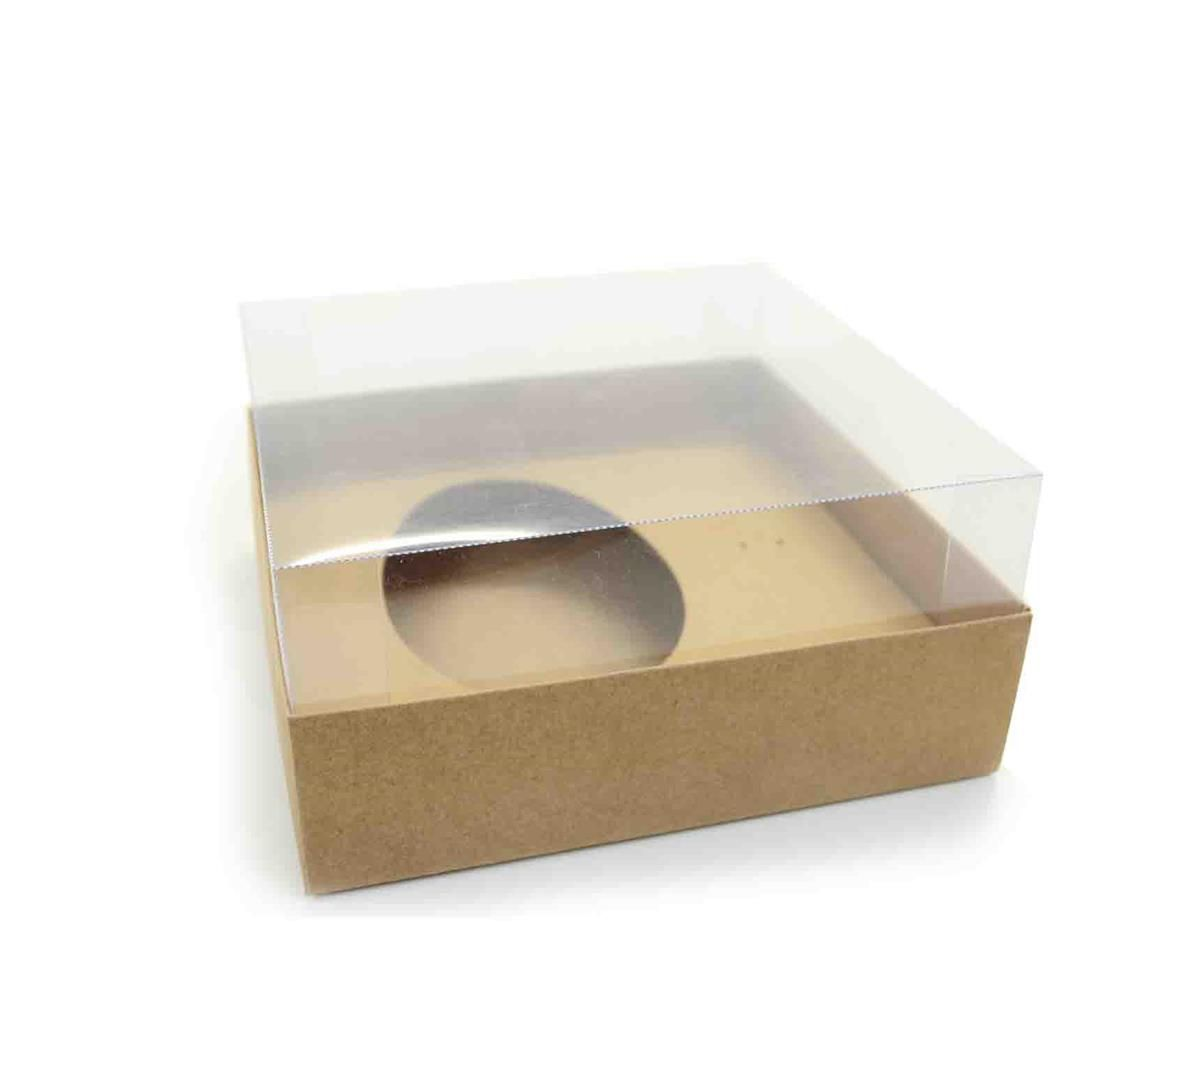 Ref 004 Kraft - Caixa Ovo 250/350 gr. c/ tampa ALTA - 17,5x17,5x8 cm - c/ 10 unidades